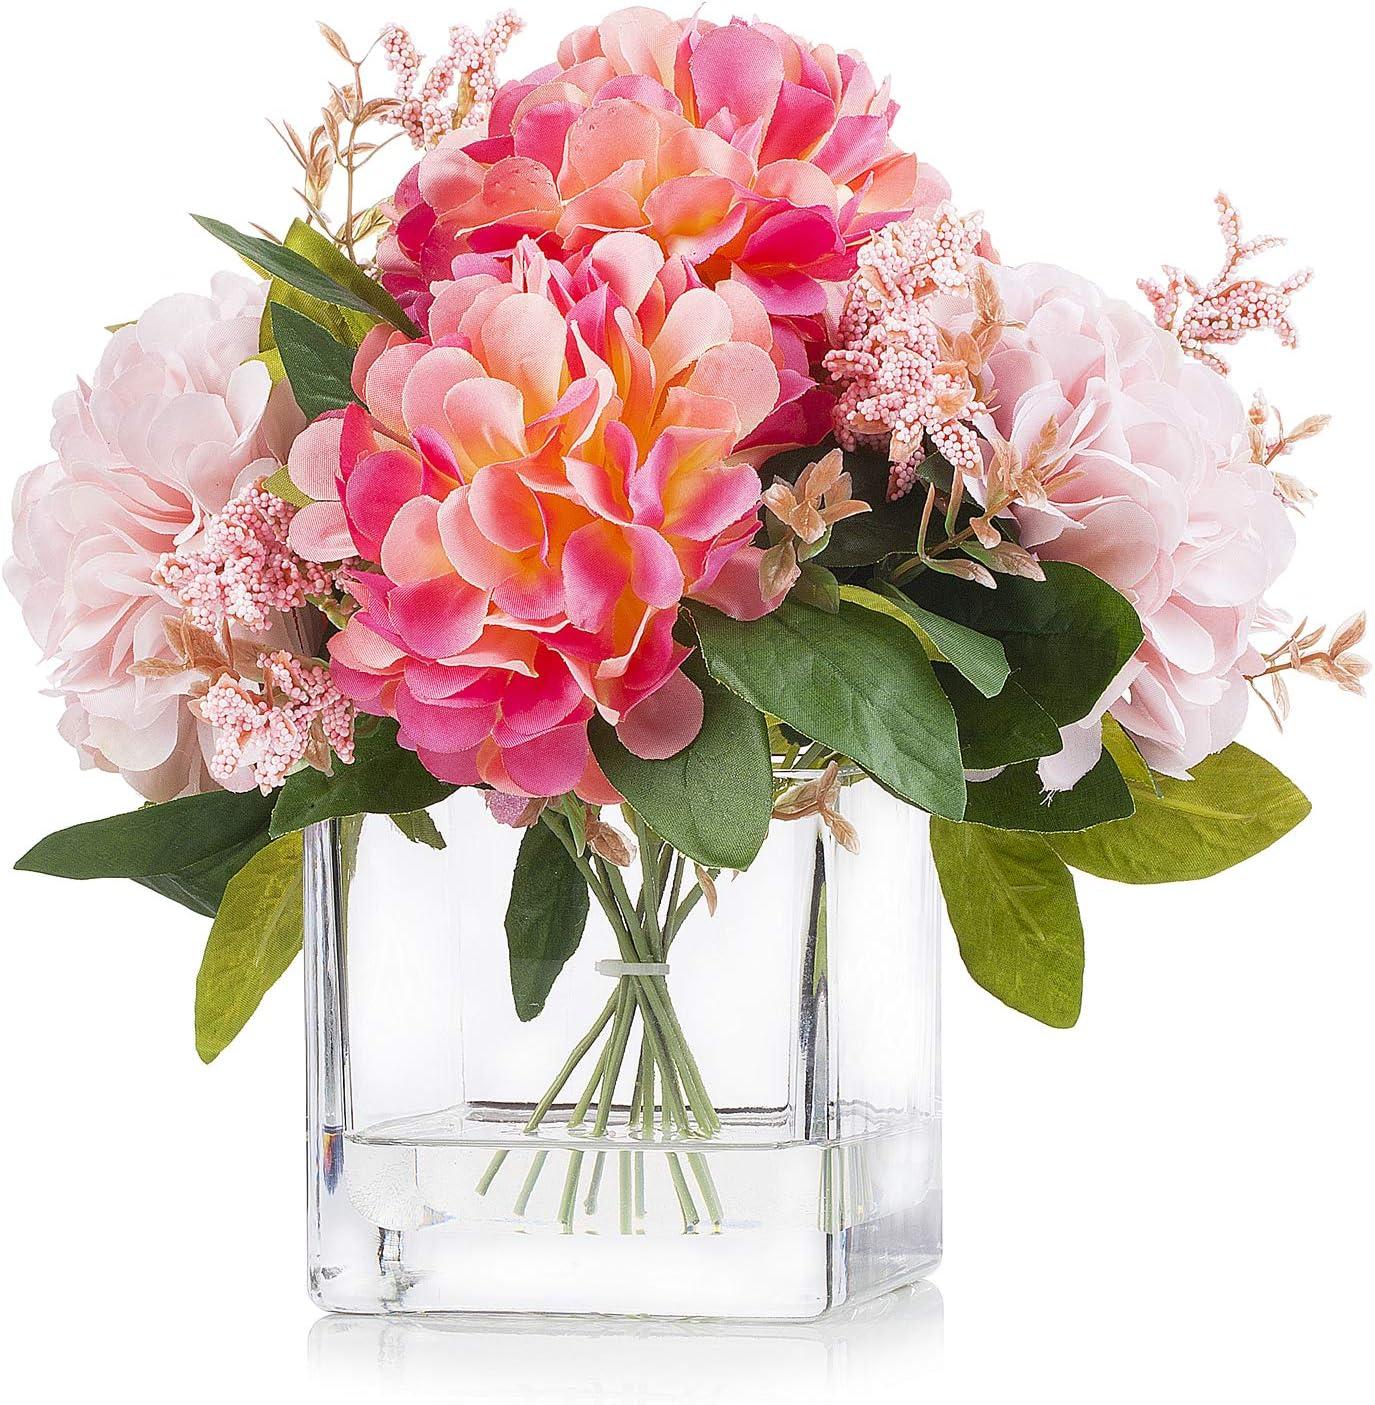 Enova Home Artificial Silk Dahlia Flower Arrangements in Cube Glass Vase for Home Wedding Decoration (Pink)